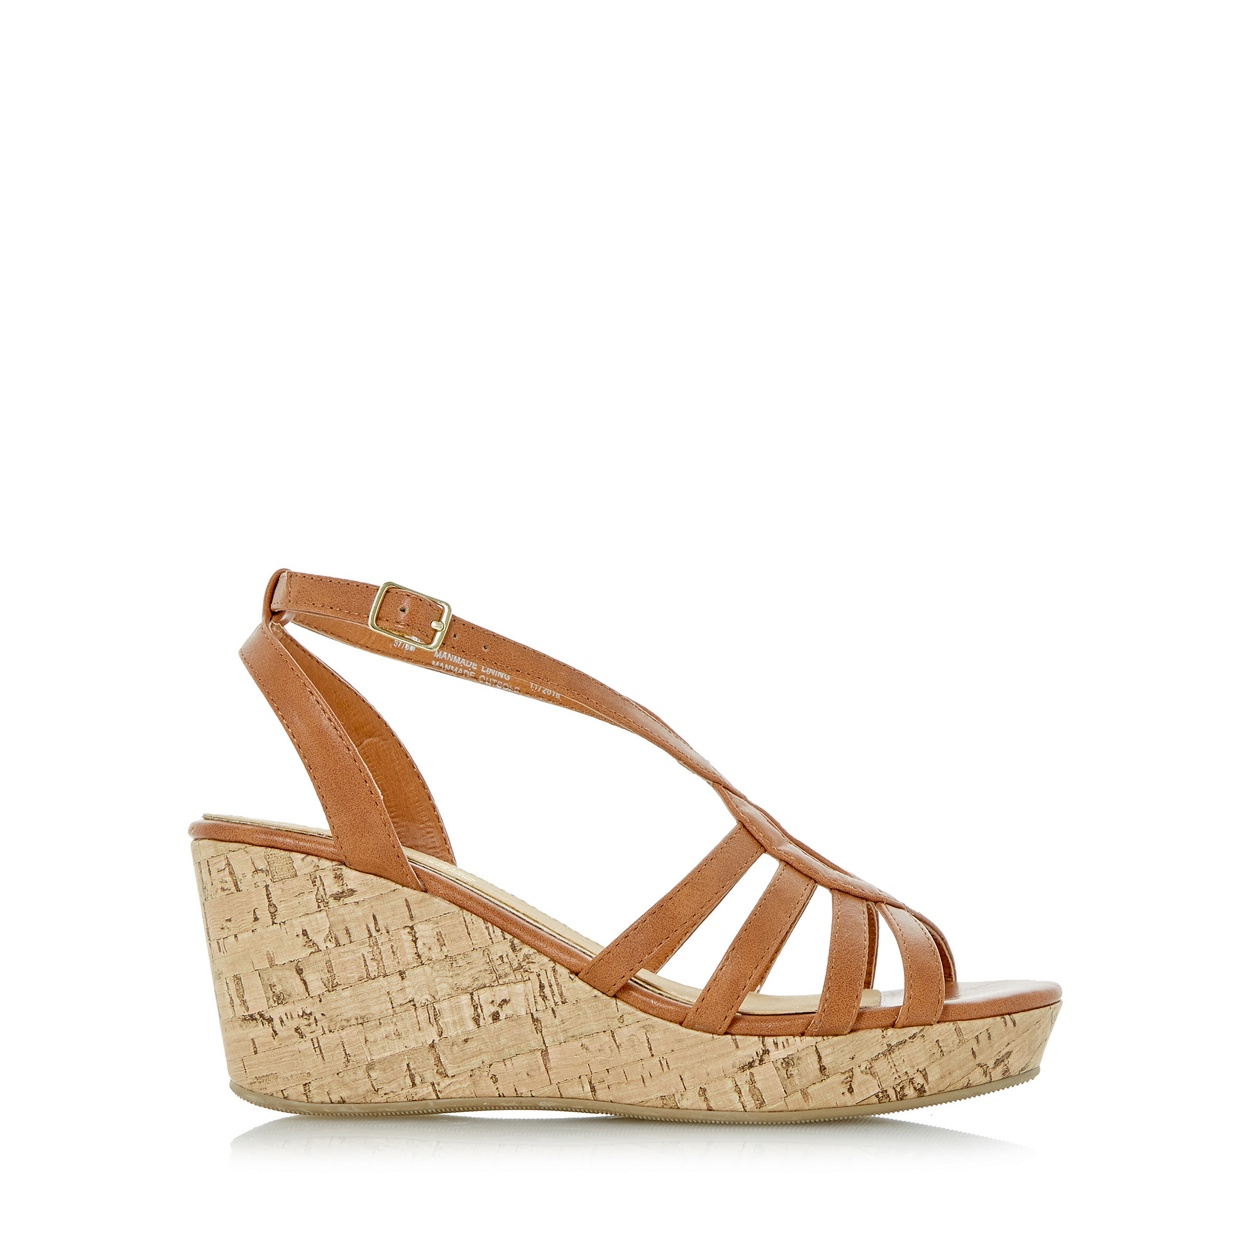 Women's sandals debenhams - About This Item